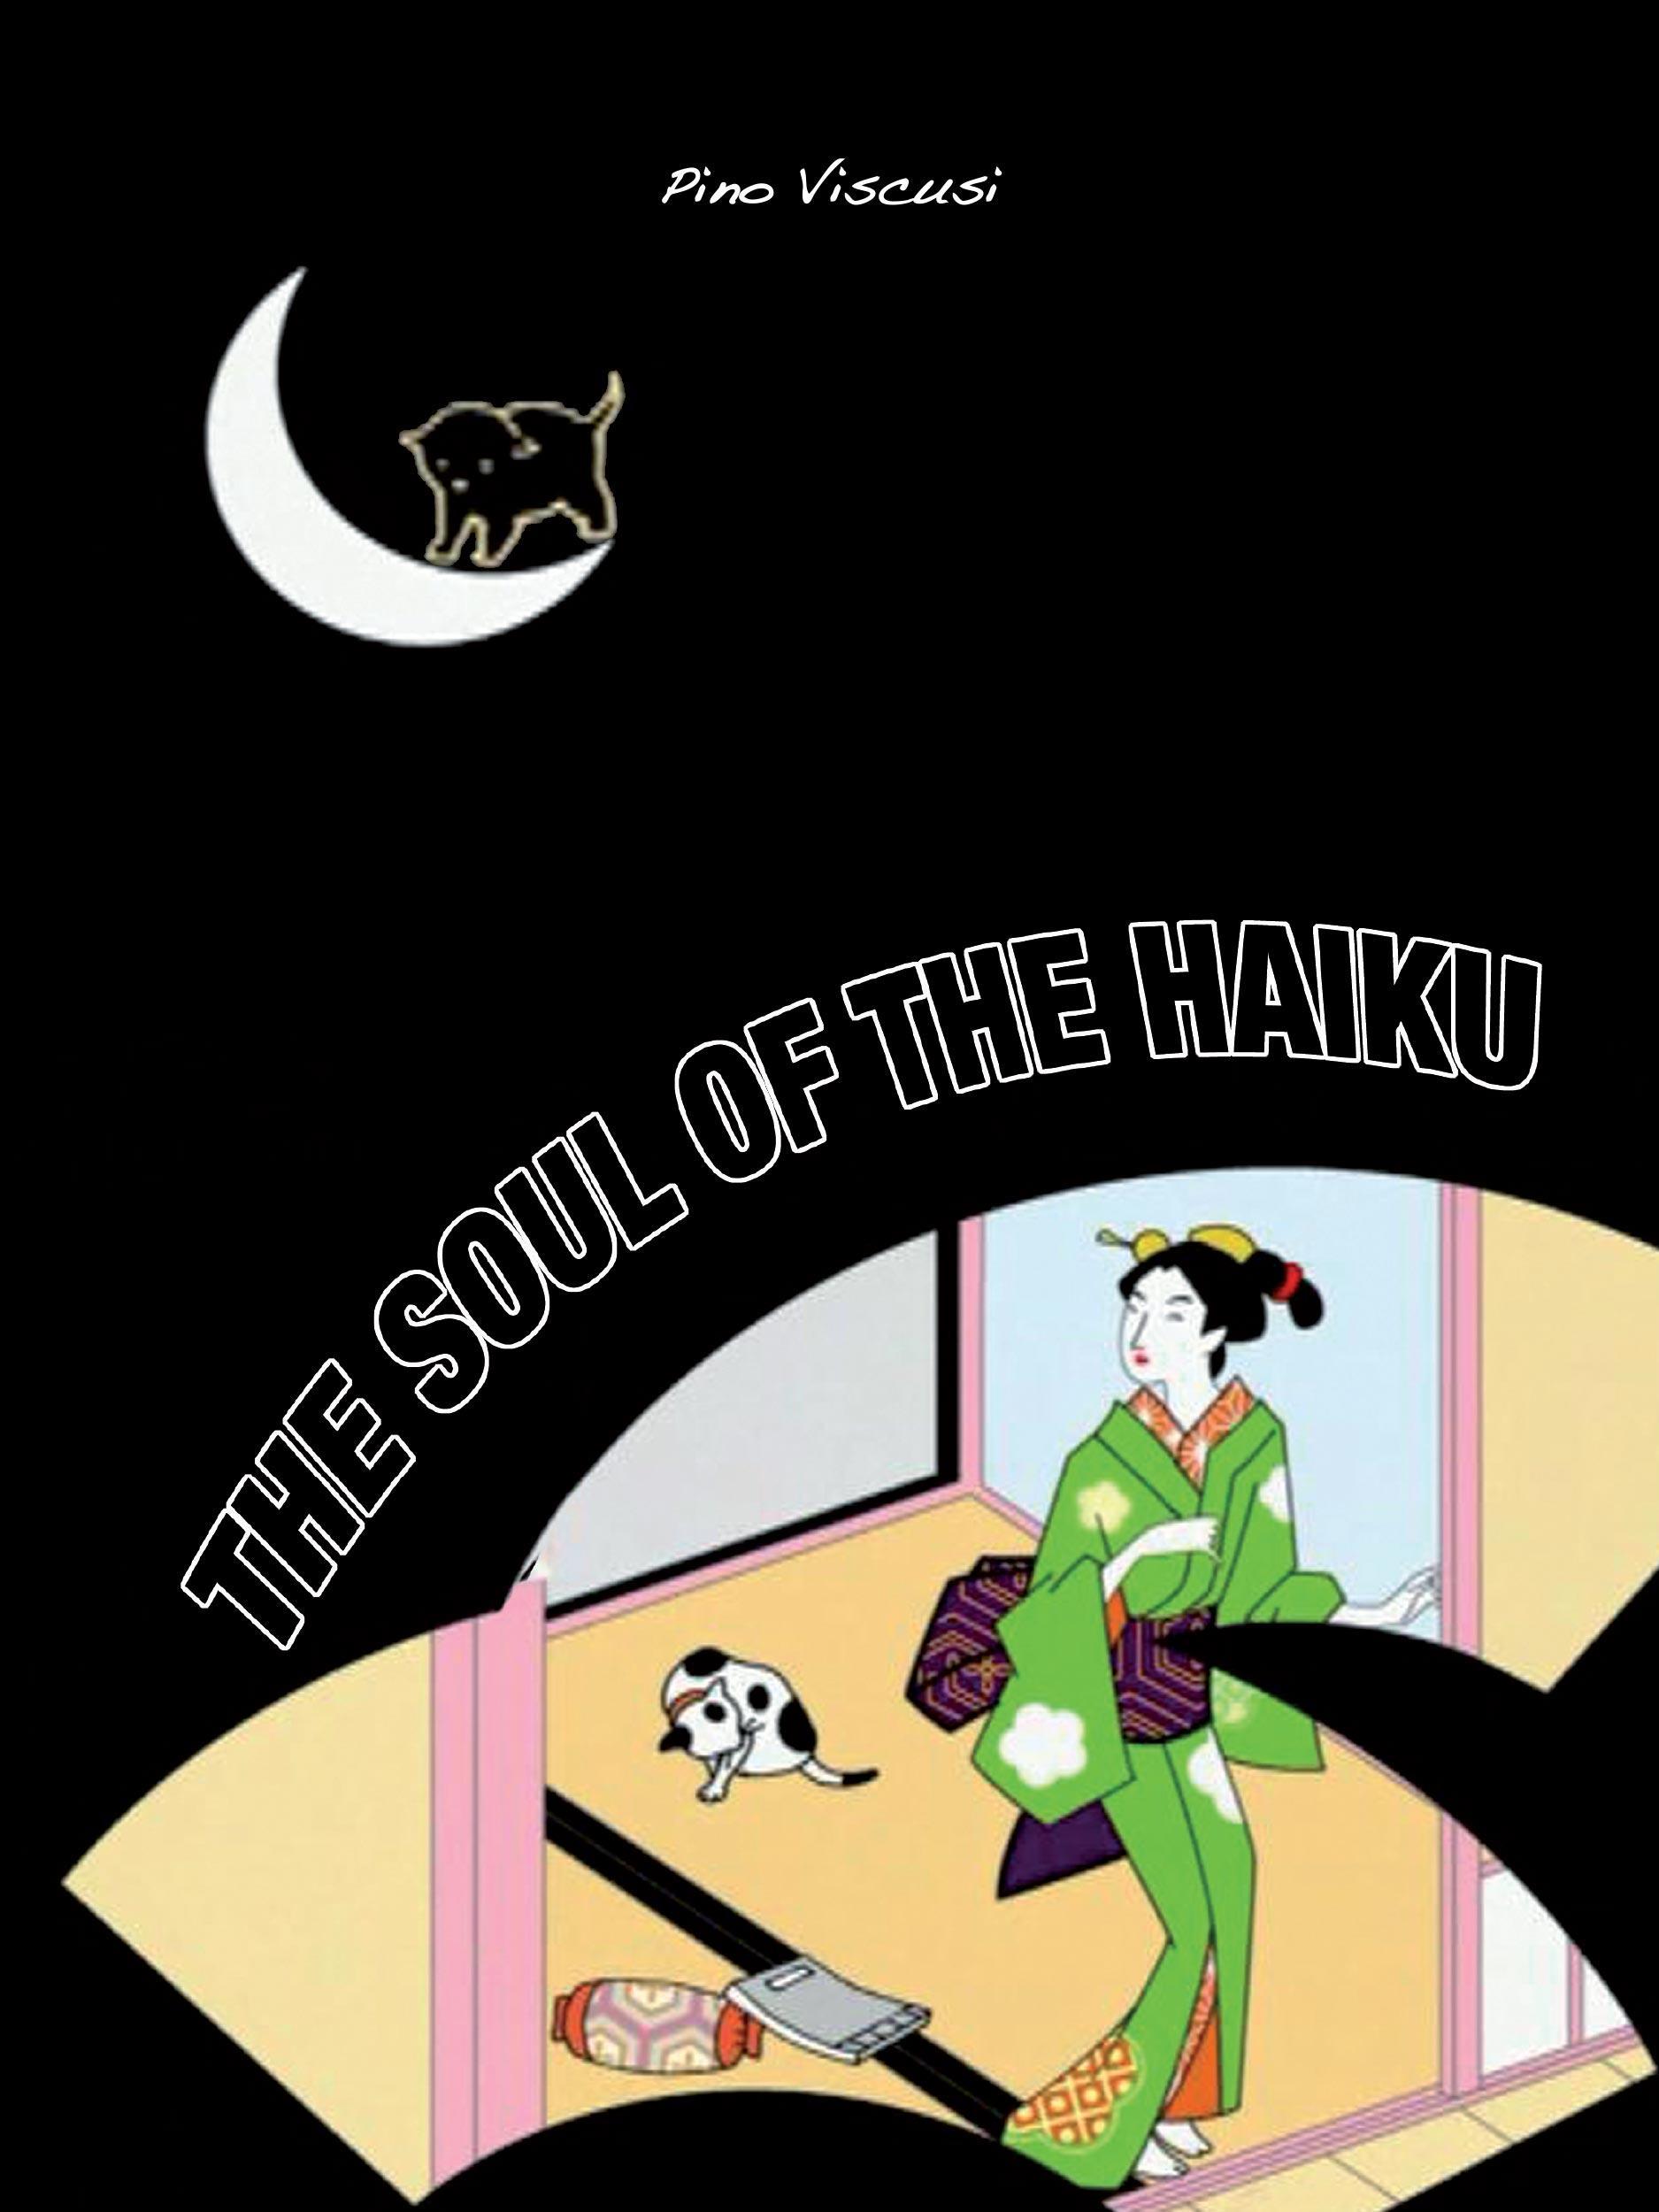 The Soul of the Haiku